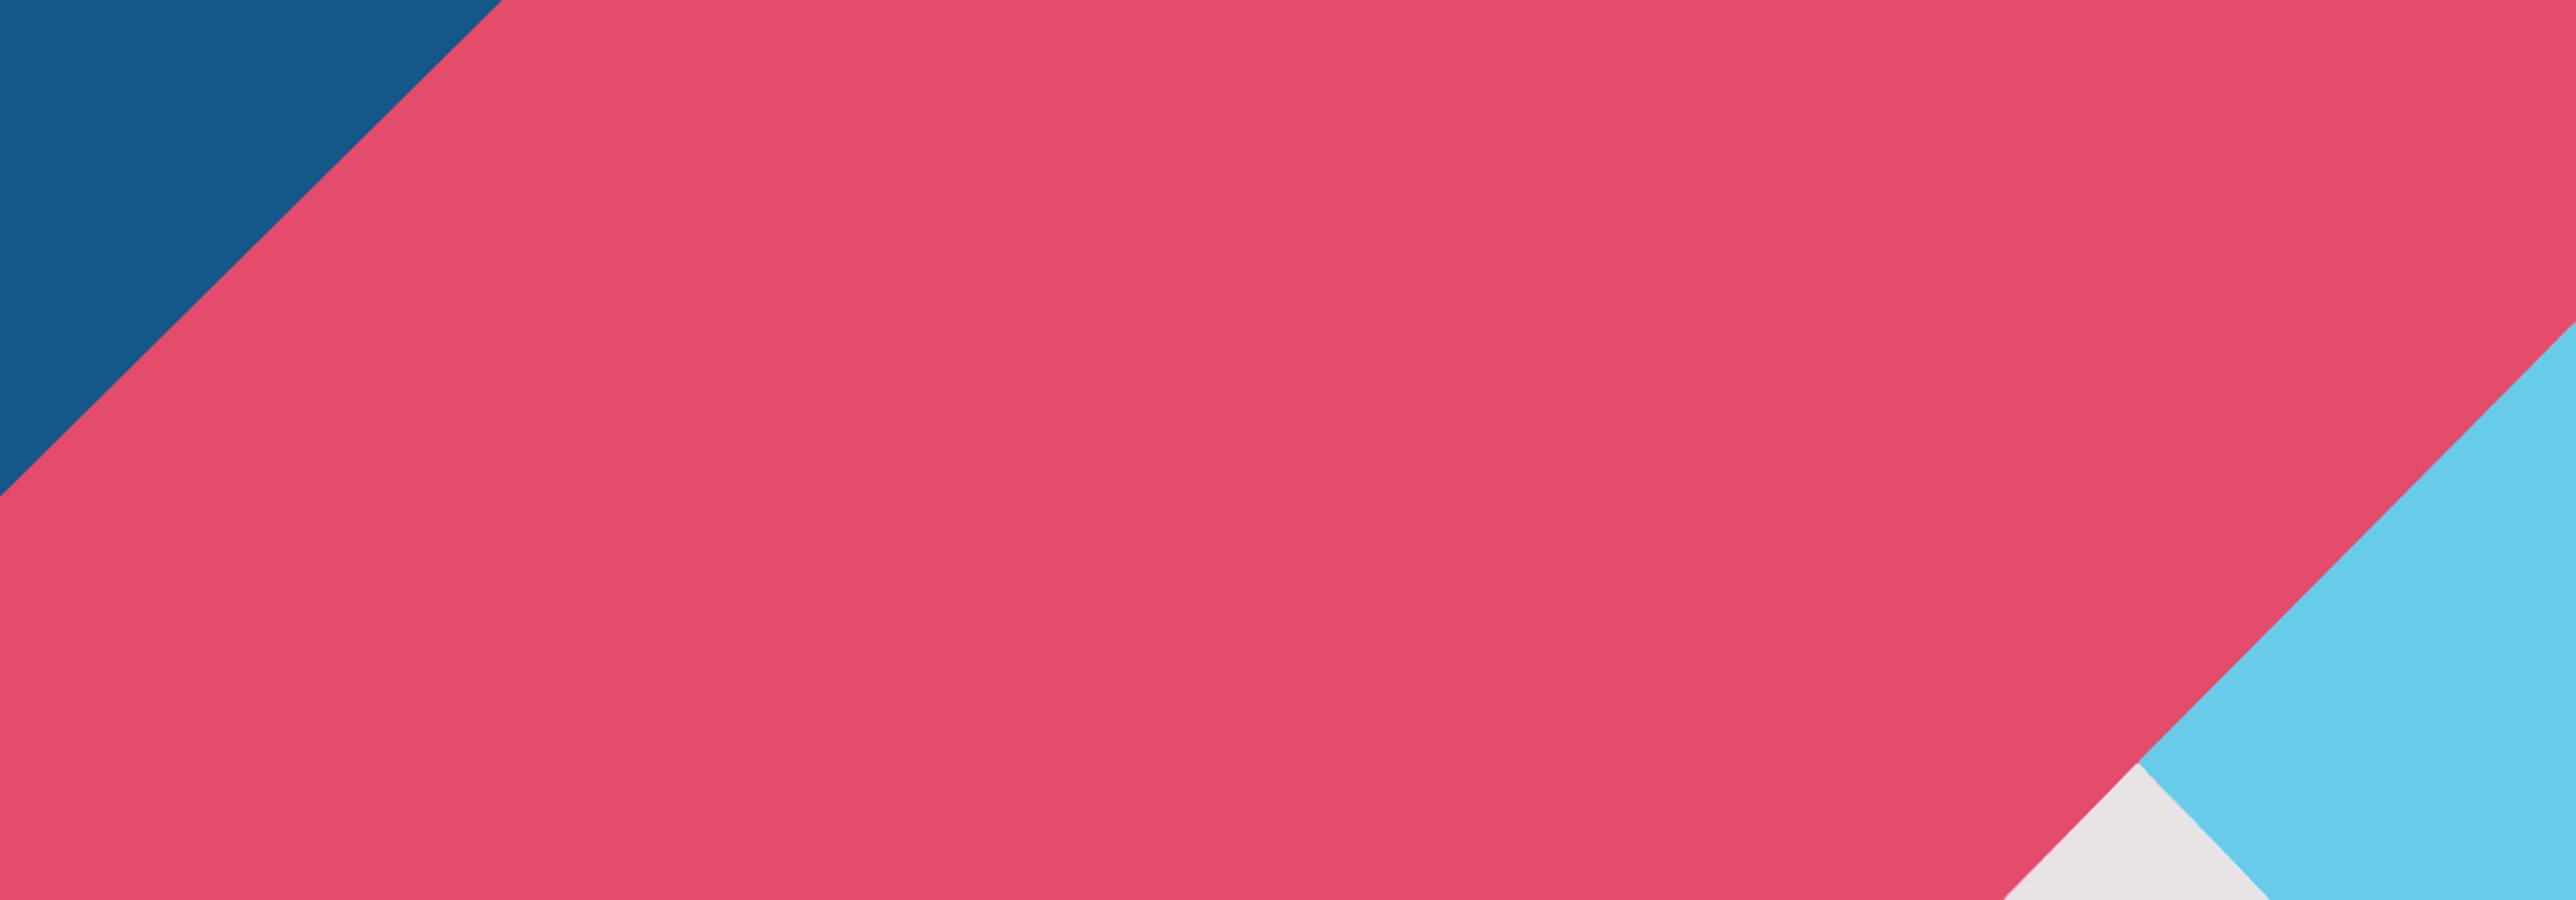 geometry-background-minae1ea6821a6749d4a2ebabf77928b8e4